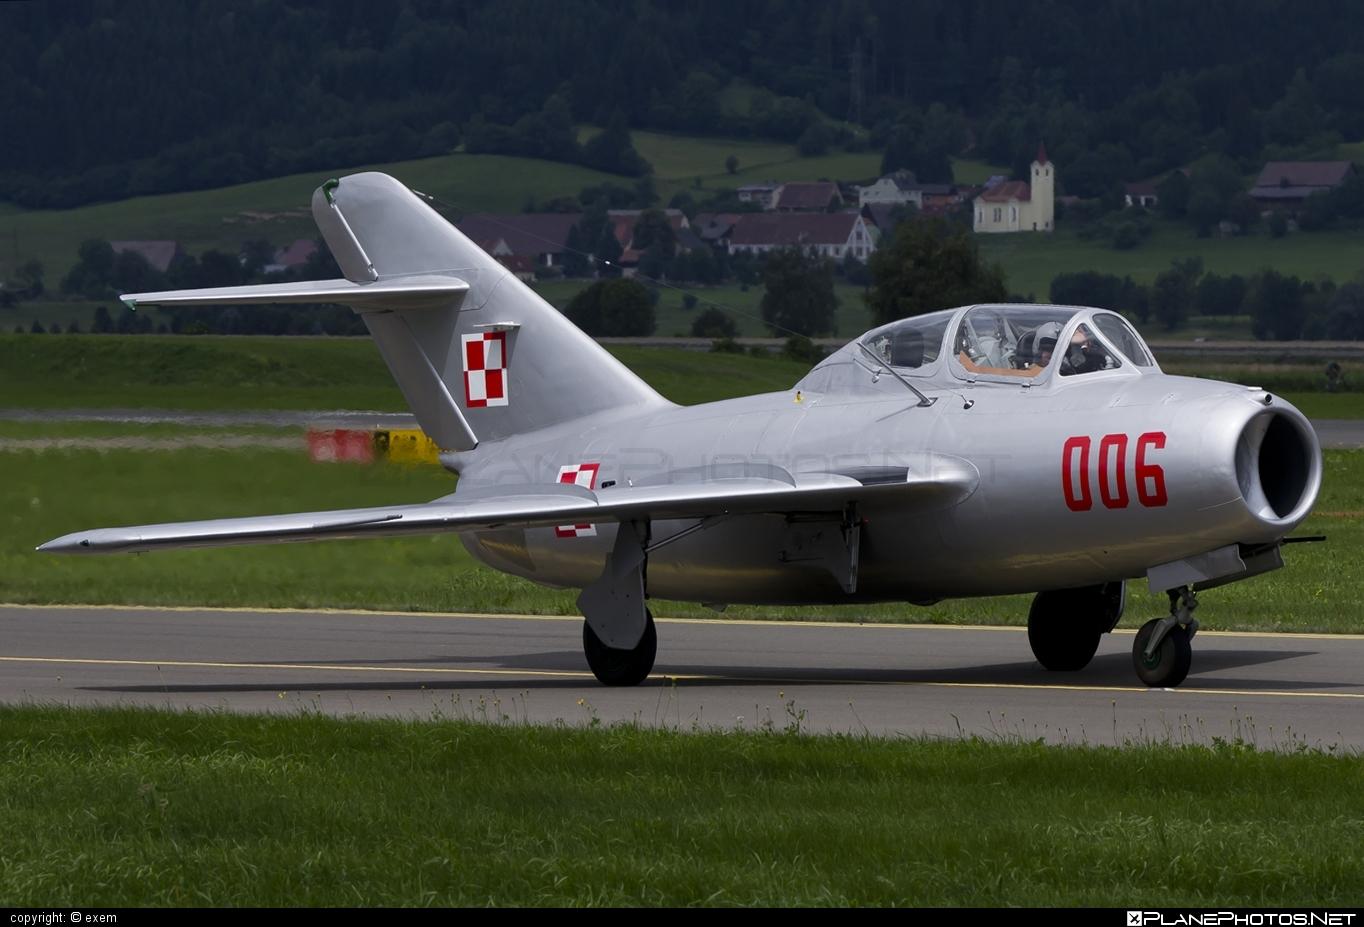 PZL-Mielec SB Lim-2 - SP-YNZ operated by Private operator #mig15 #pzl #pzlmielec #pzlmielecsblim2 #pzlsblim2 #sblim2